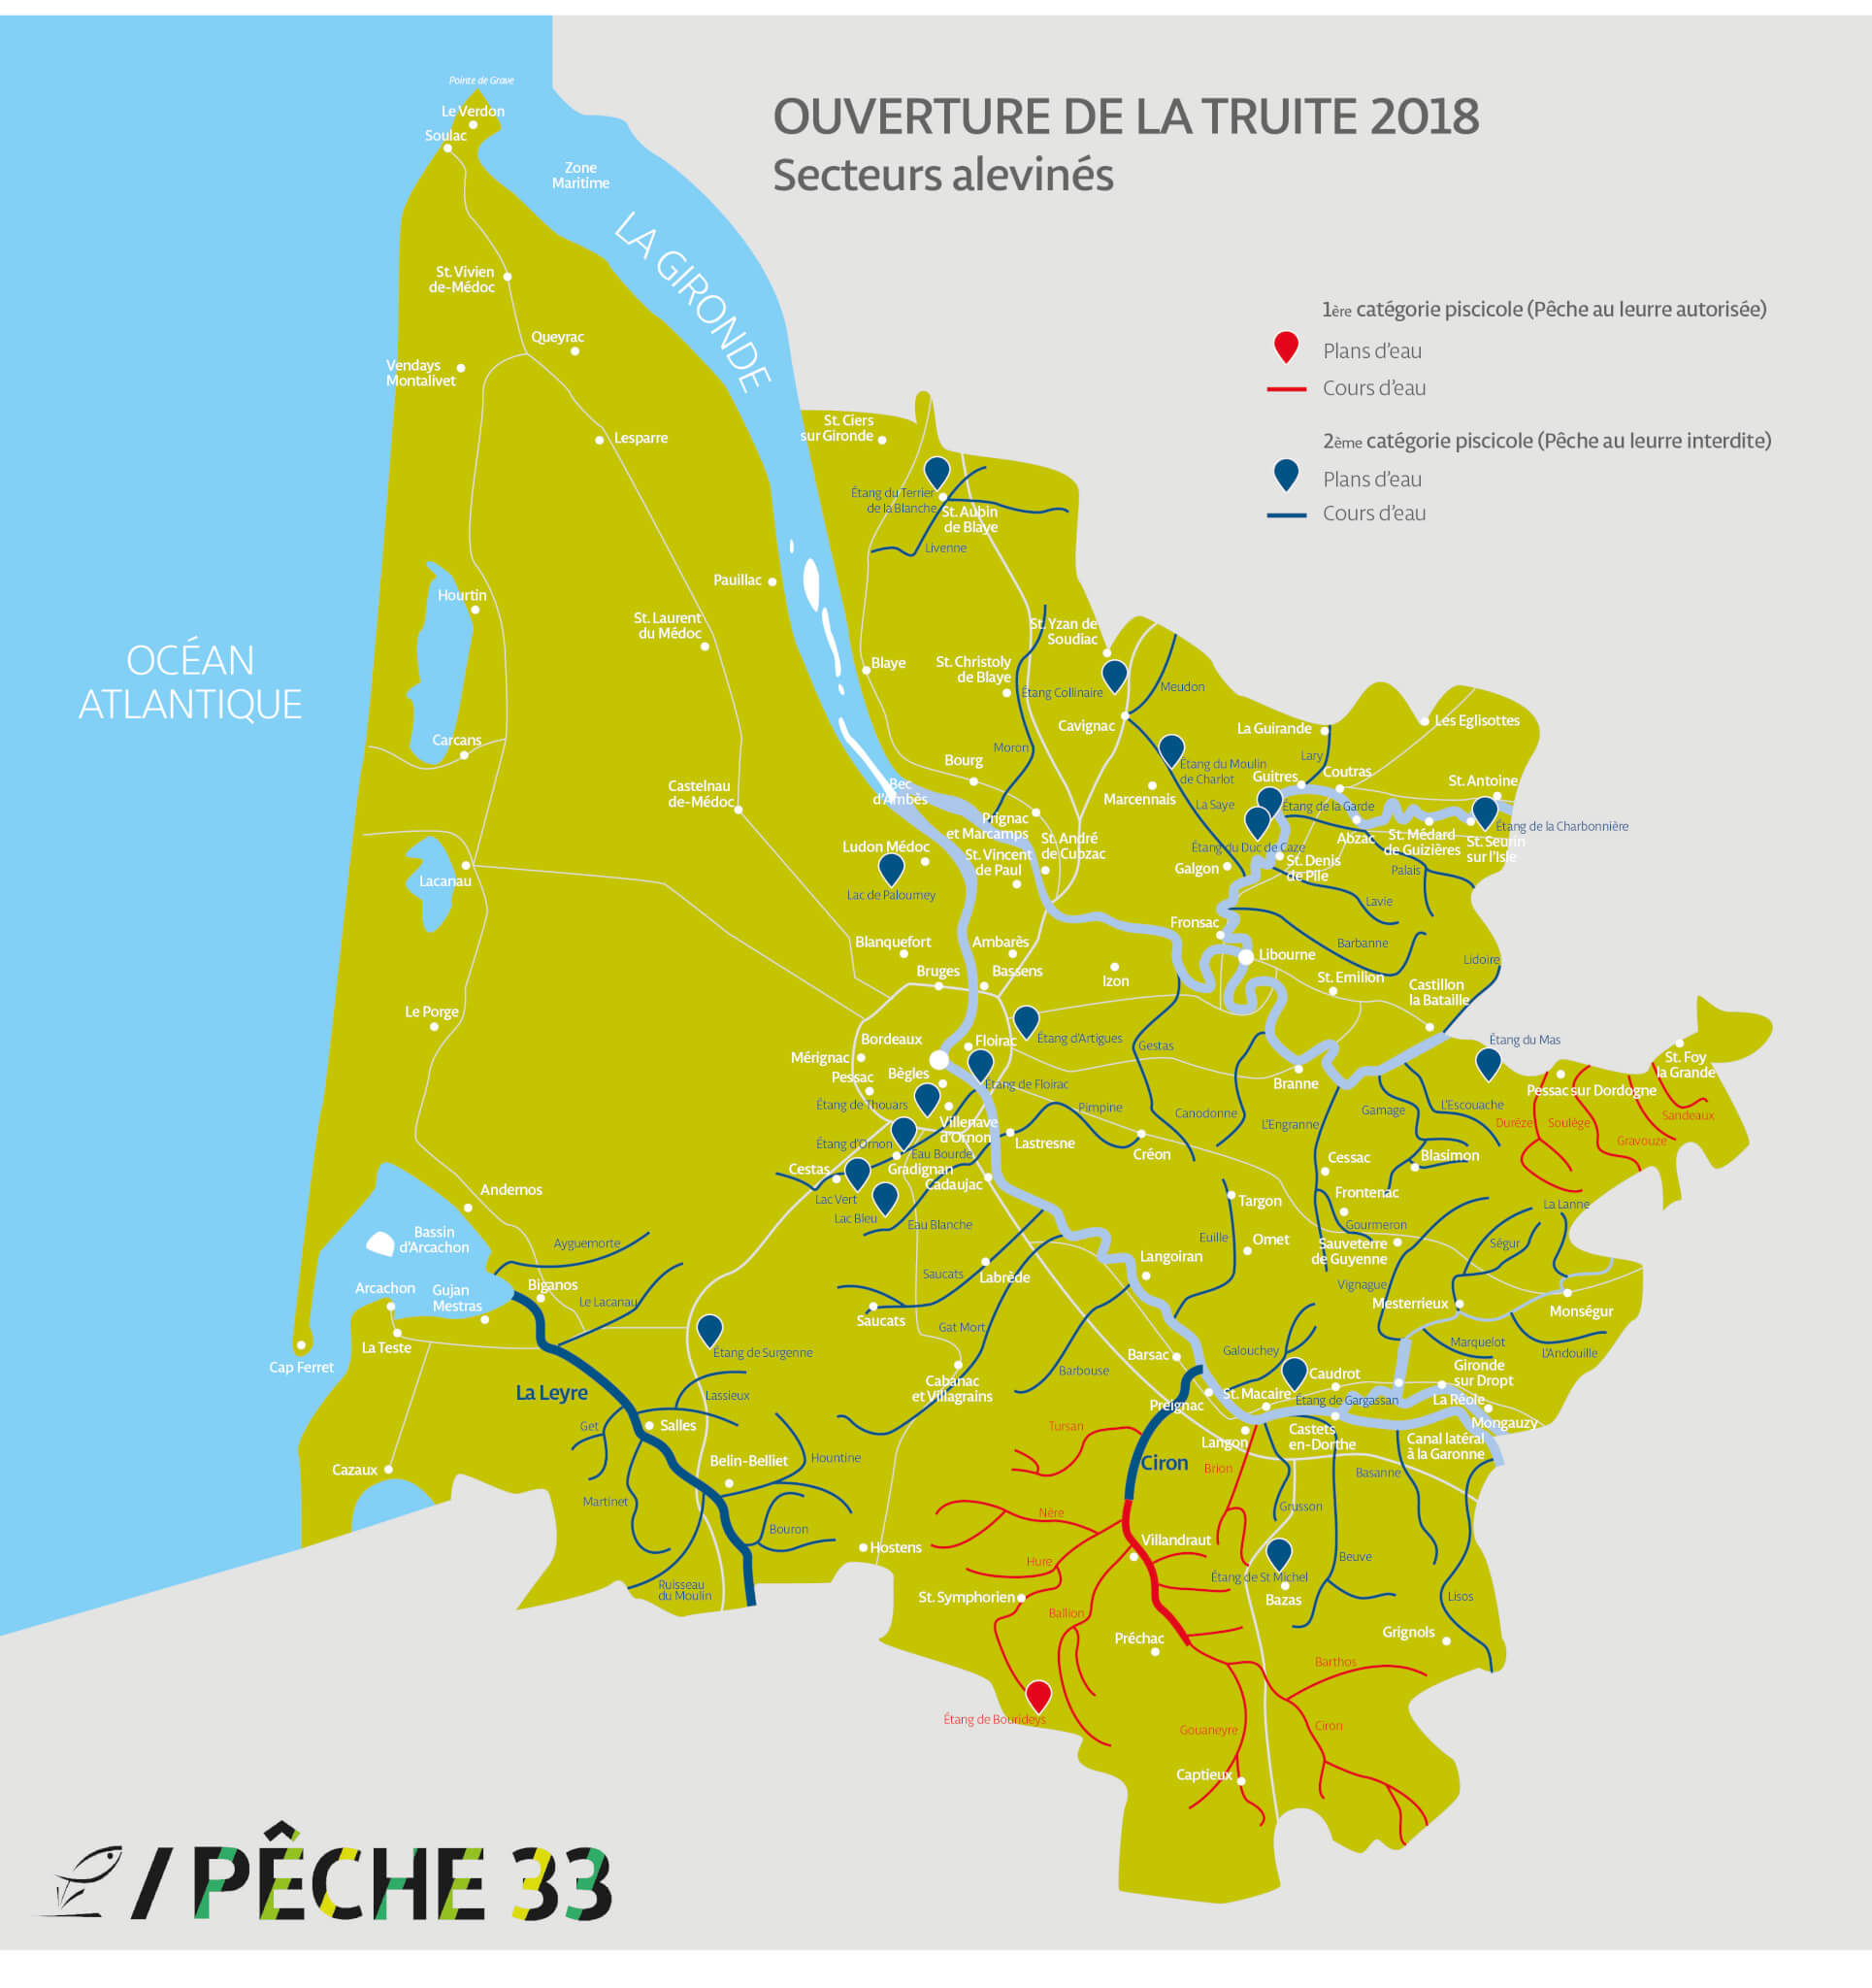 CarteGironde-Ouverture truite2018